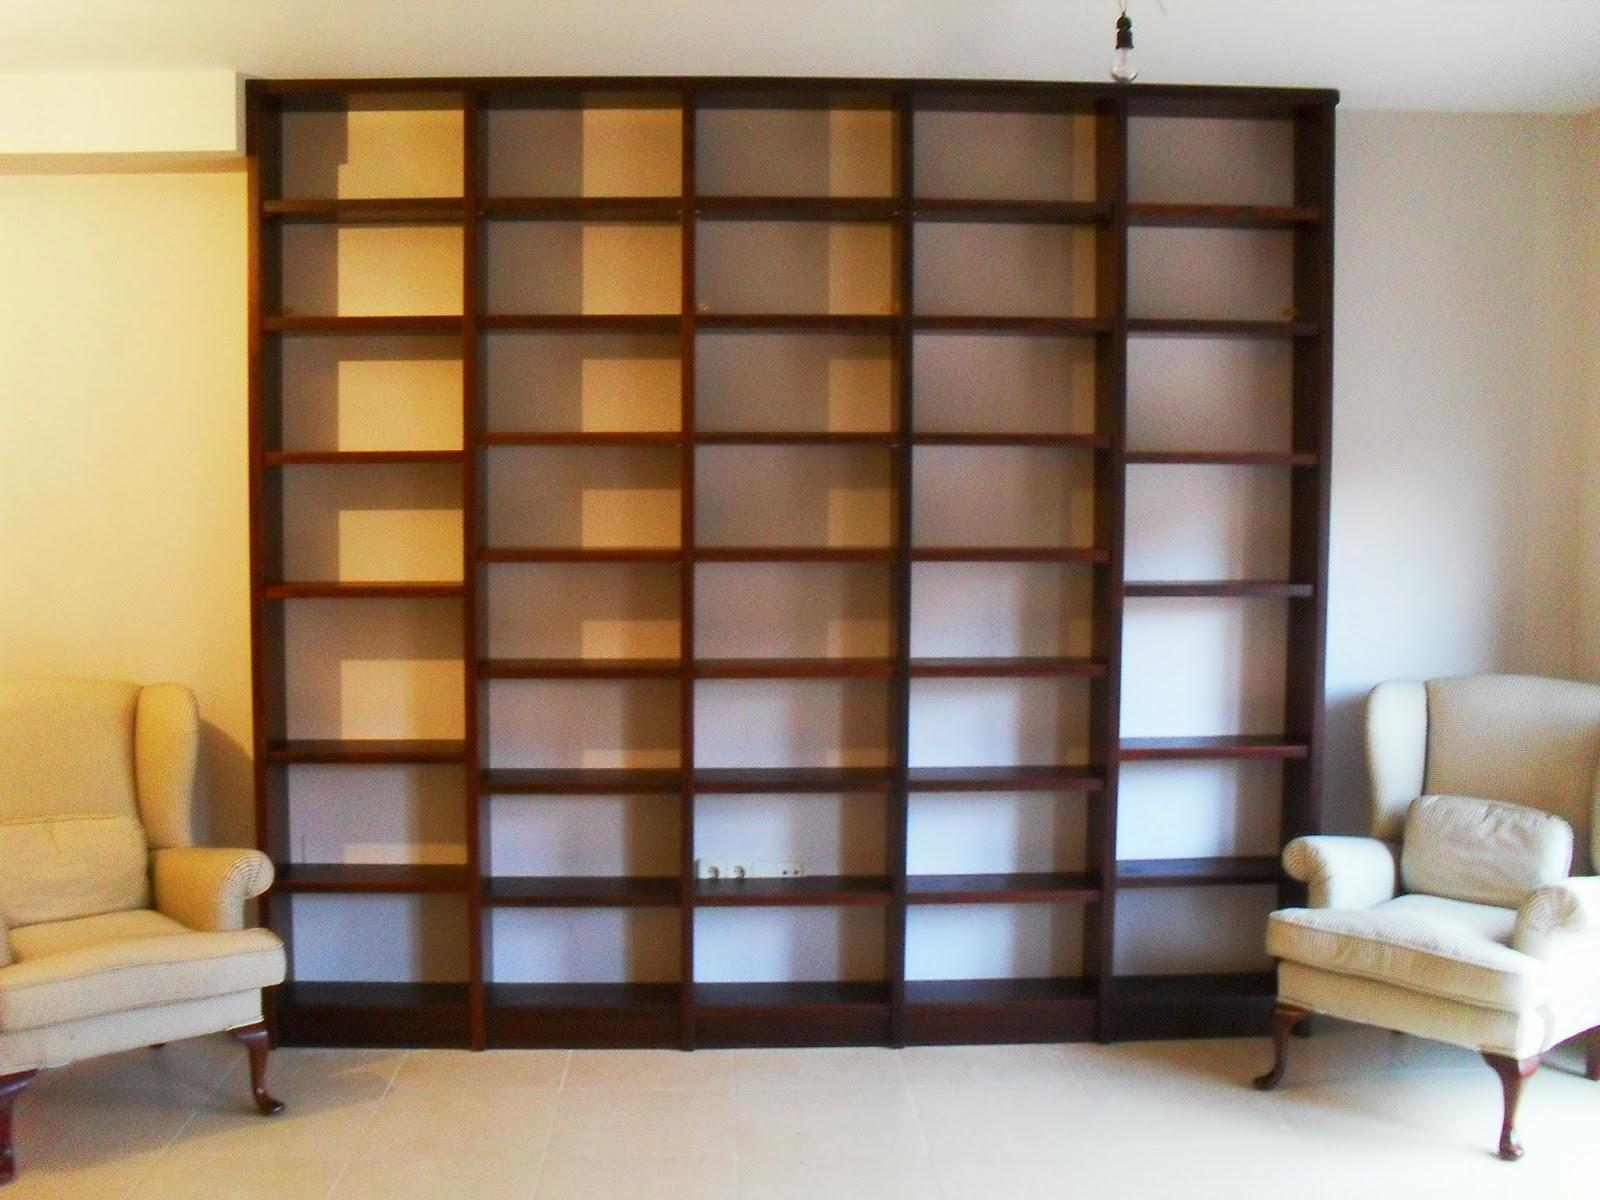 Libreria a medida madrid mueble a medida 617075183 elcarpinterodemadrid - Librerias a medida en madrid ...